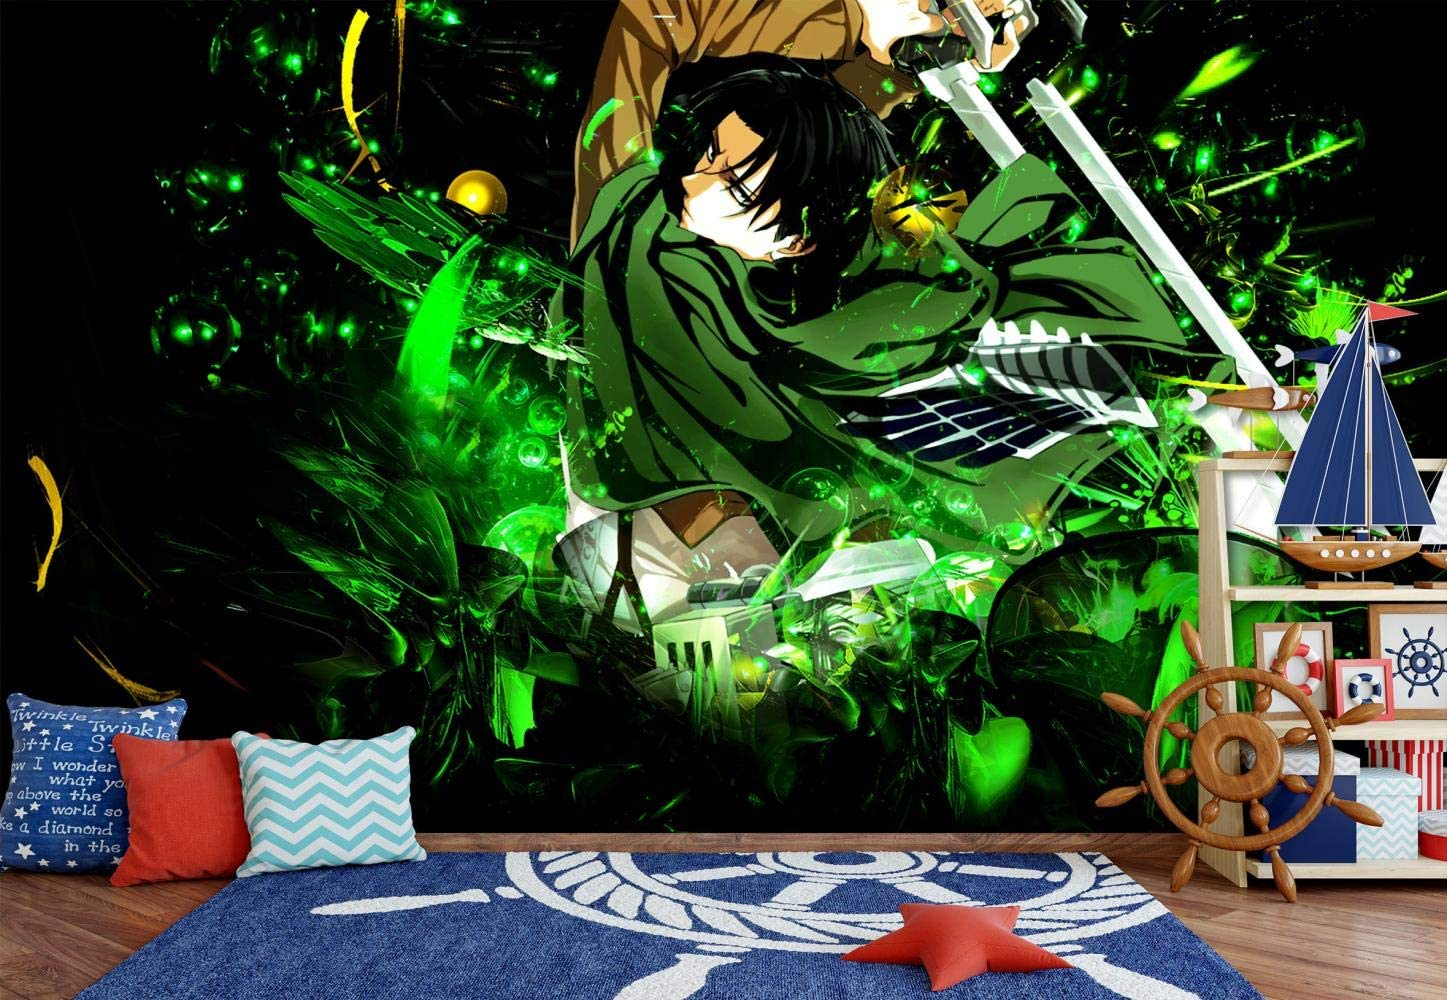 Zxjwzw Attack On Titan Cartoon Anime Wallpaper Tv Sofa Background 3d Wallpaper Mural For House Kids Living Bedroom Office Gym Shop Hallway Studio Wall Art Decor 200cmx140cm W H Amazon Co Uk Diy Tools